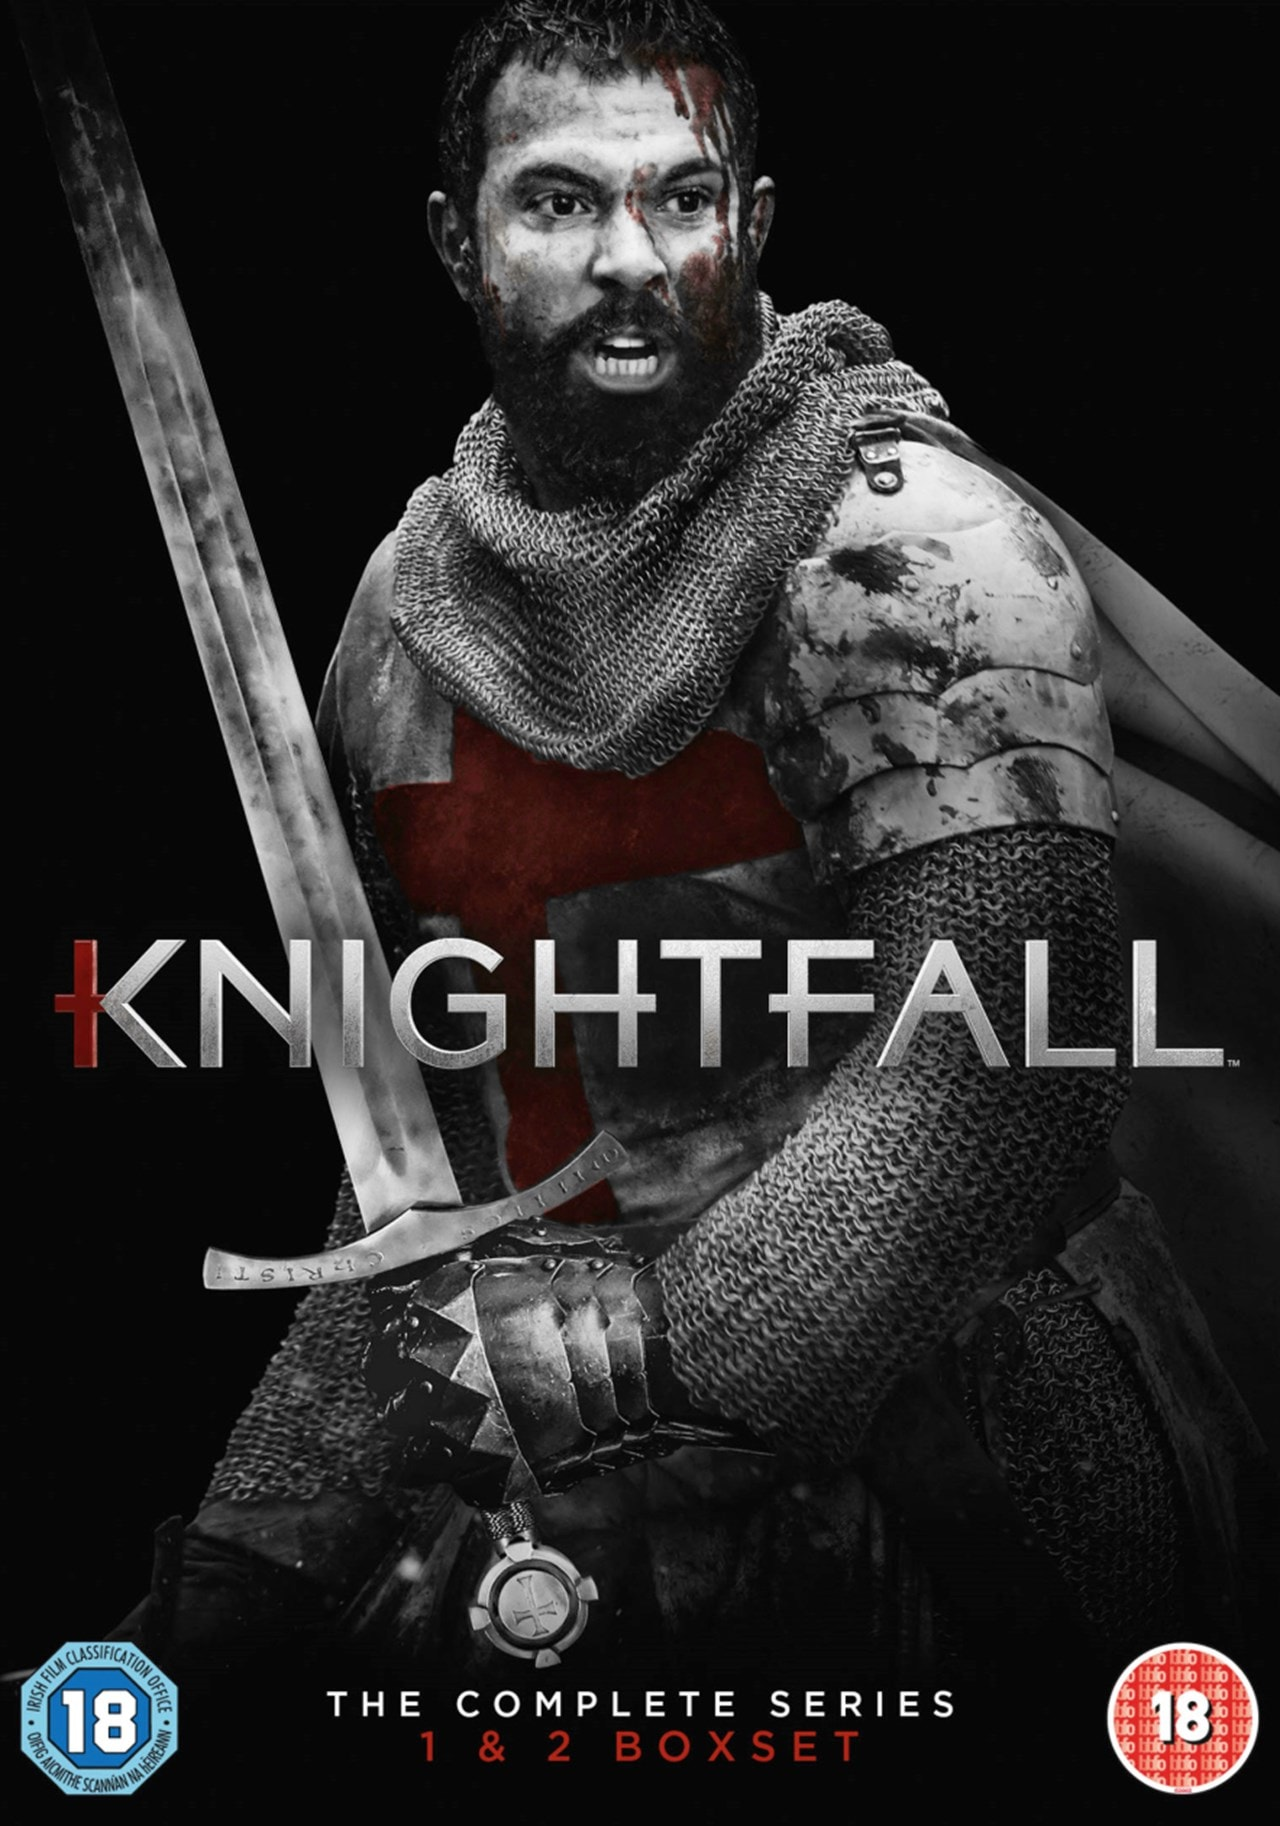 Knightfall: Season 1 & 2 - 1